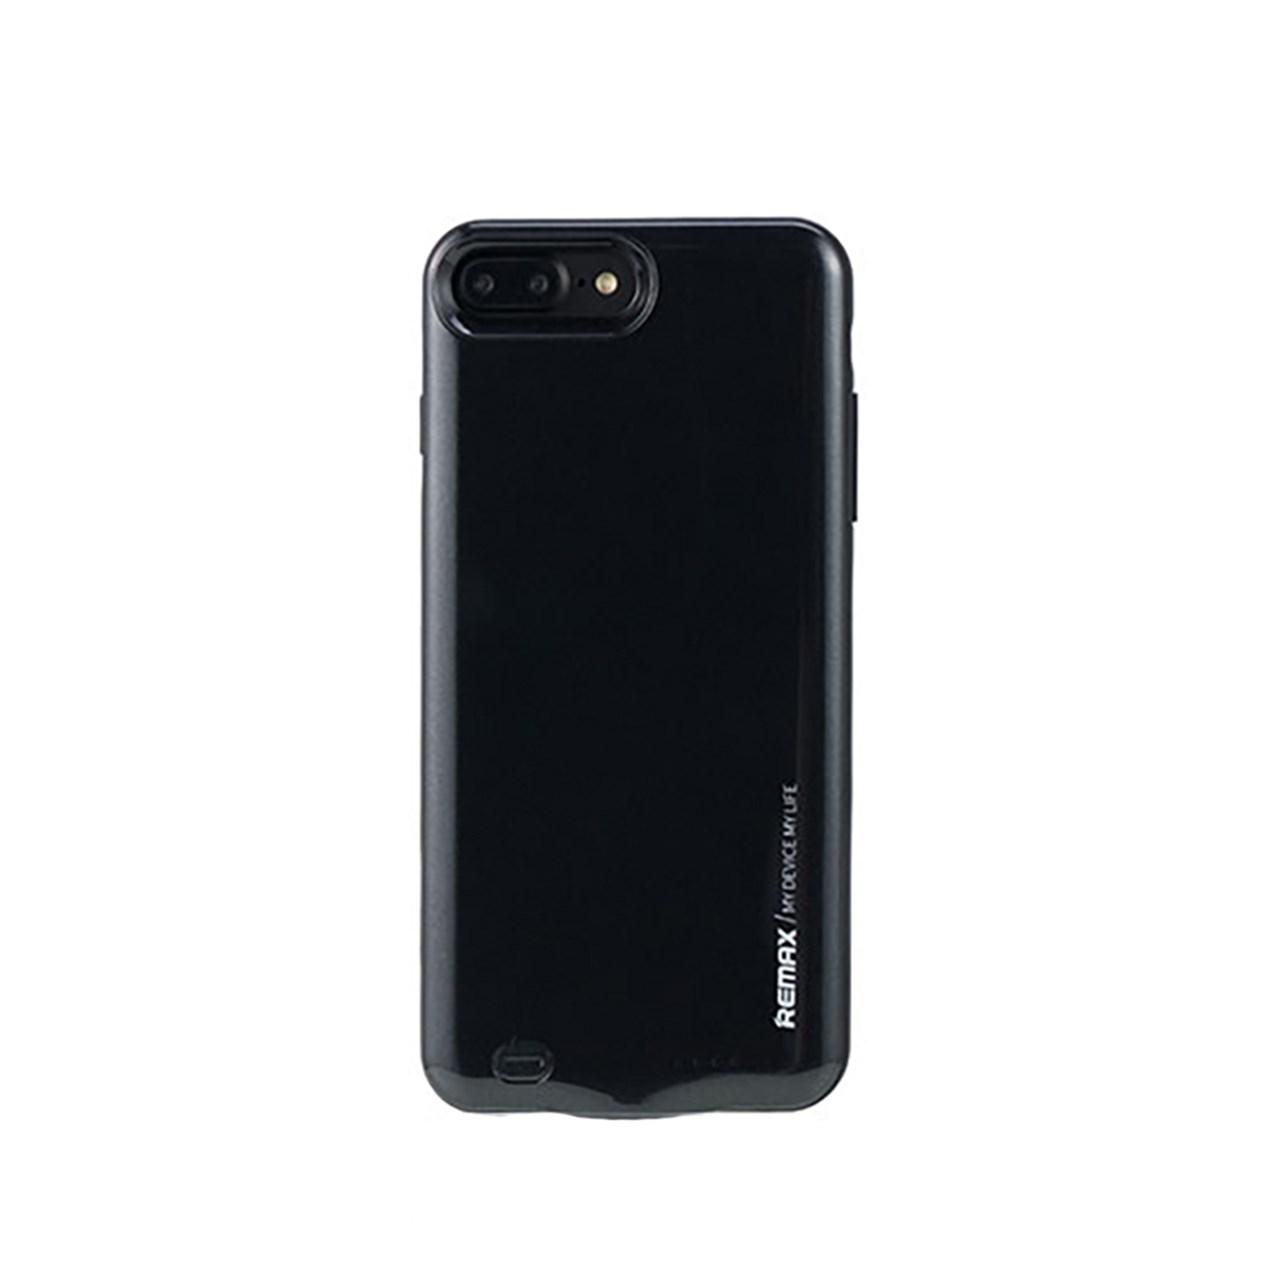 عکس کاور شارژ ریمکس مدل Energy Jacket ظرفیت 3400 میلی آمپر ساعت مناسب برای گوشی موبایل اپل iPhone 7plus